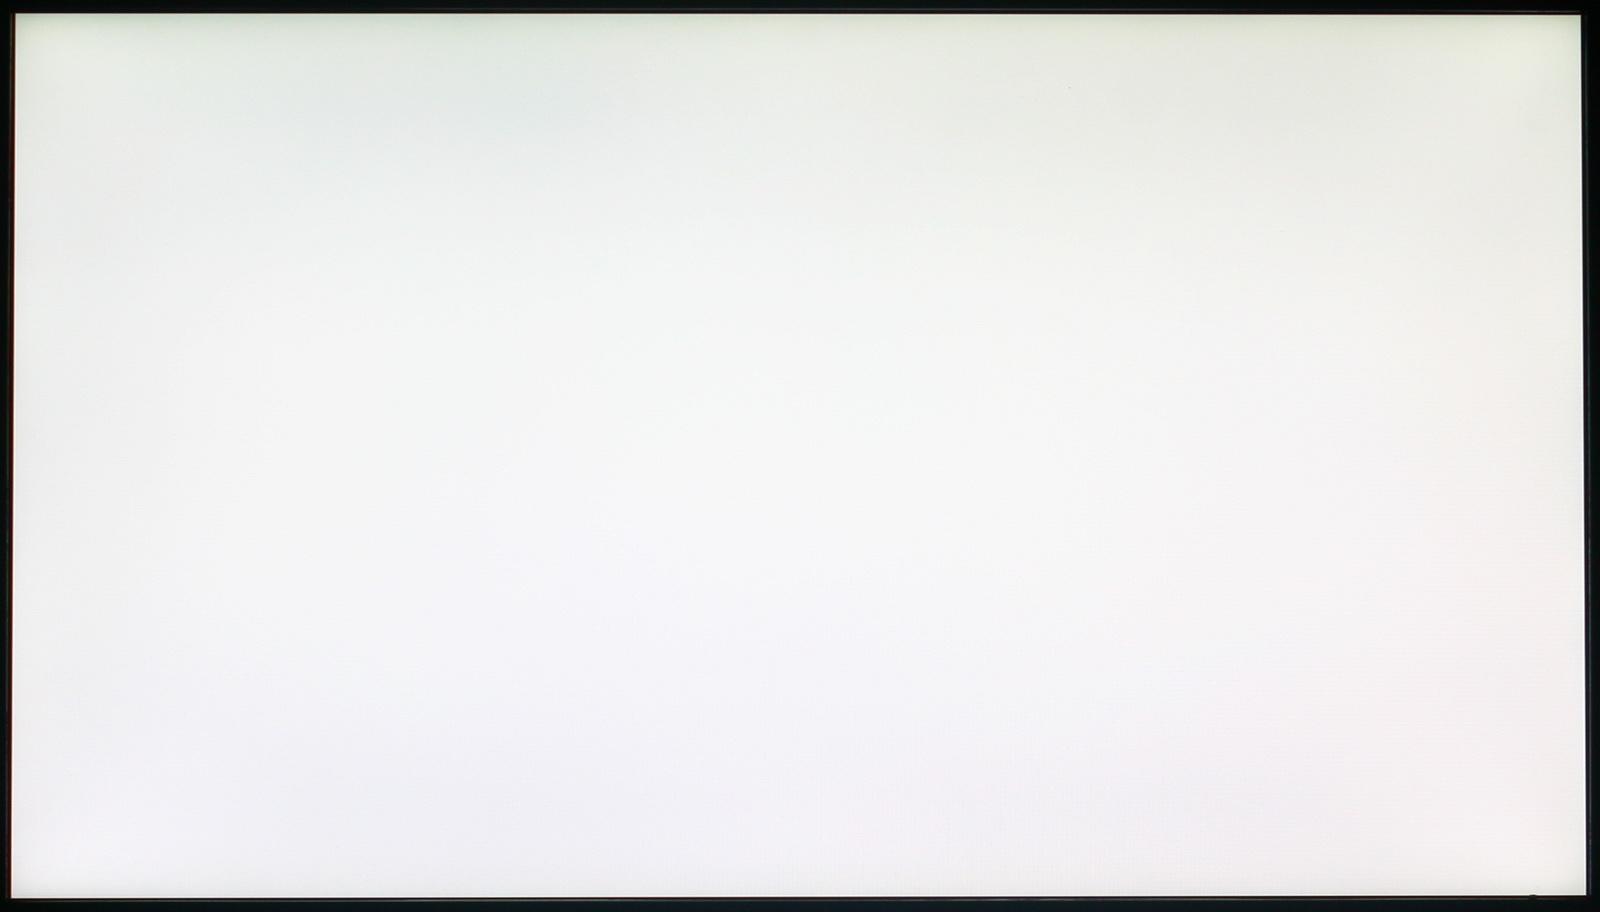 ppt 背景 背景图片 边框 模板 设计 相框 1600_912